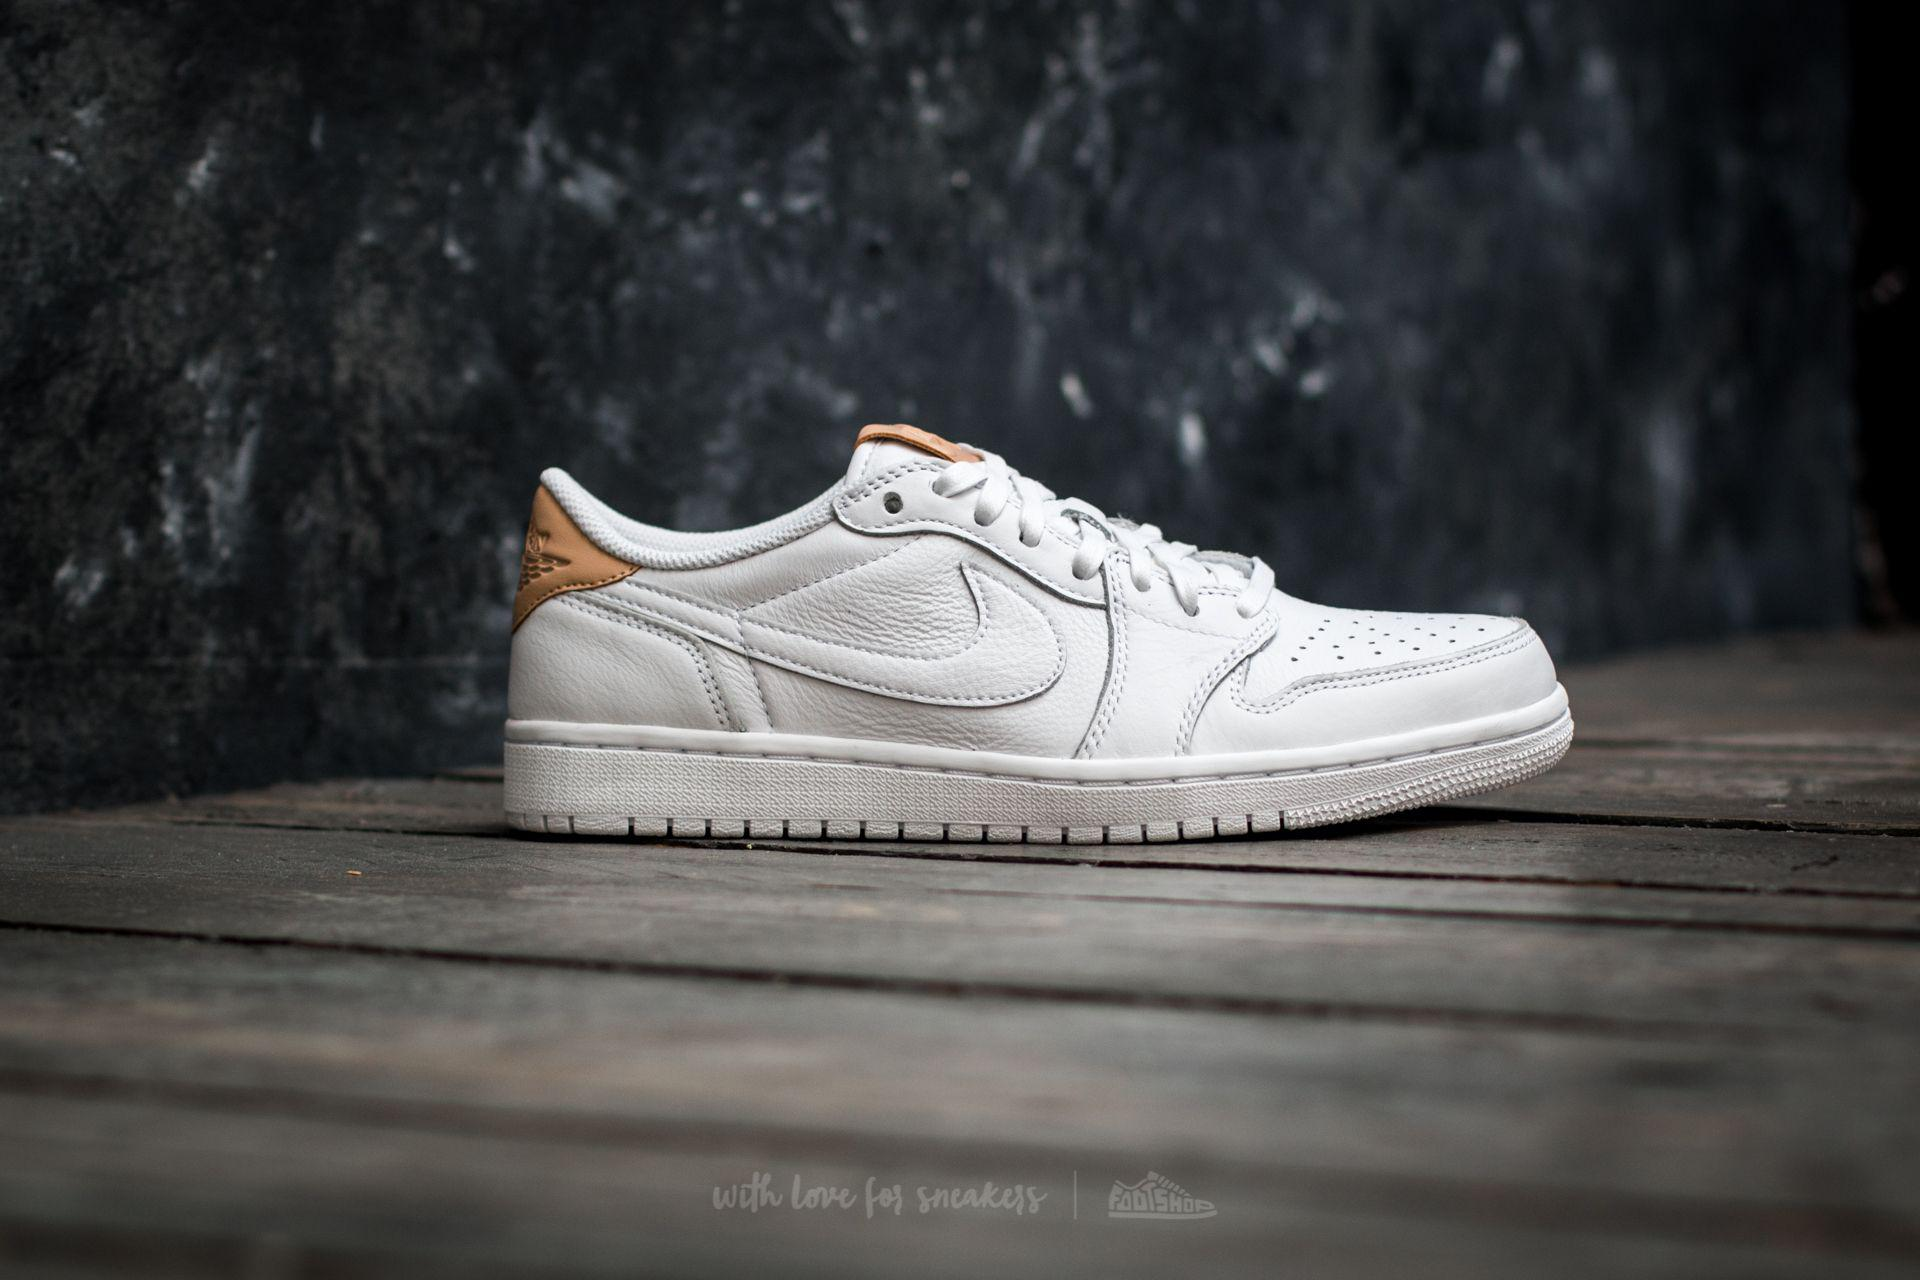 cc273ef2e545 Lyst - Nike Air 1 Retro Low Og Premium White  Vachetta Tan-white in ...